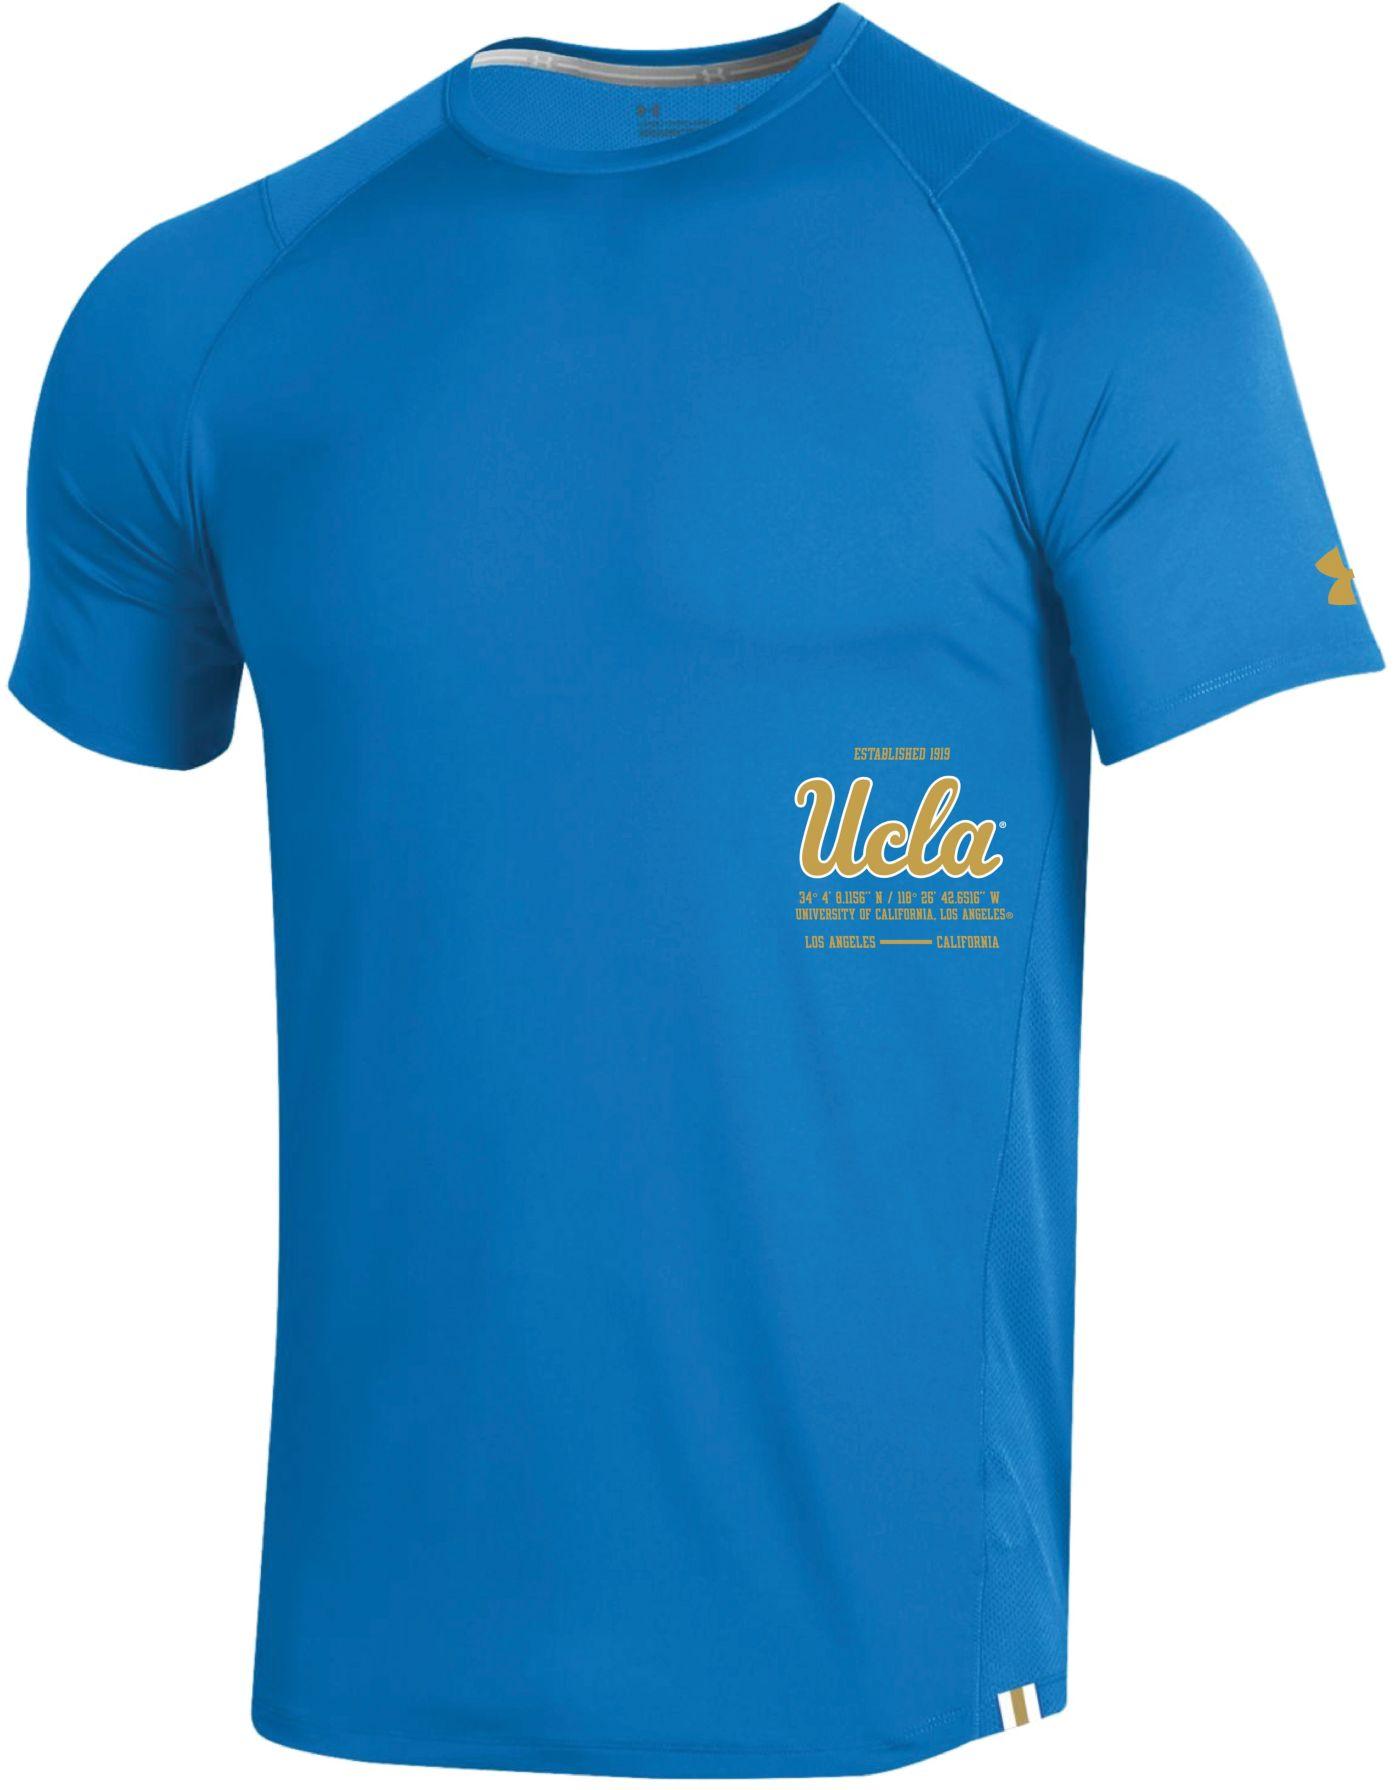 Under Armour Men's UCLA Bruins True Blue Coordinates MK1 Sideline T-Shirt